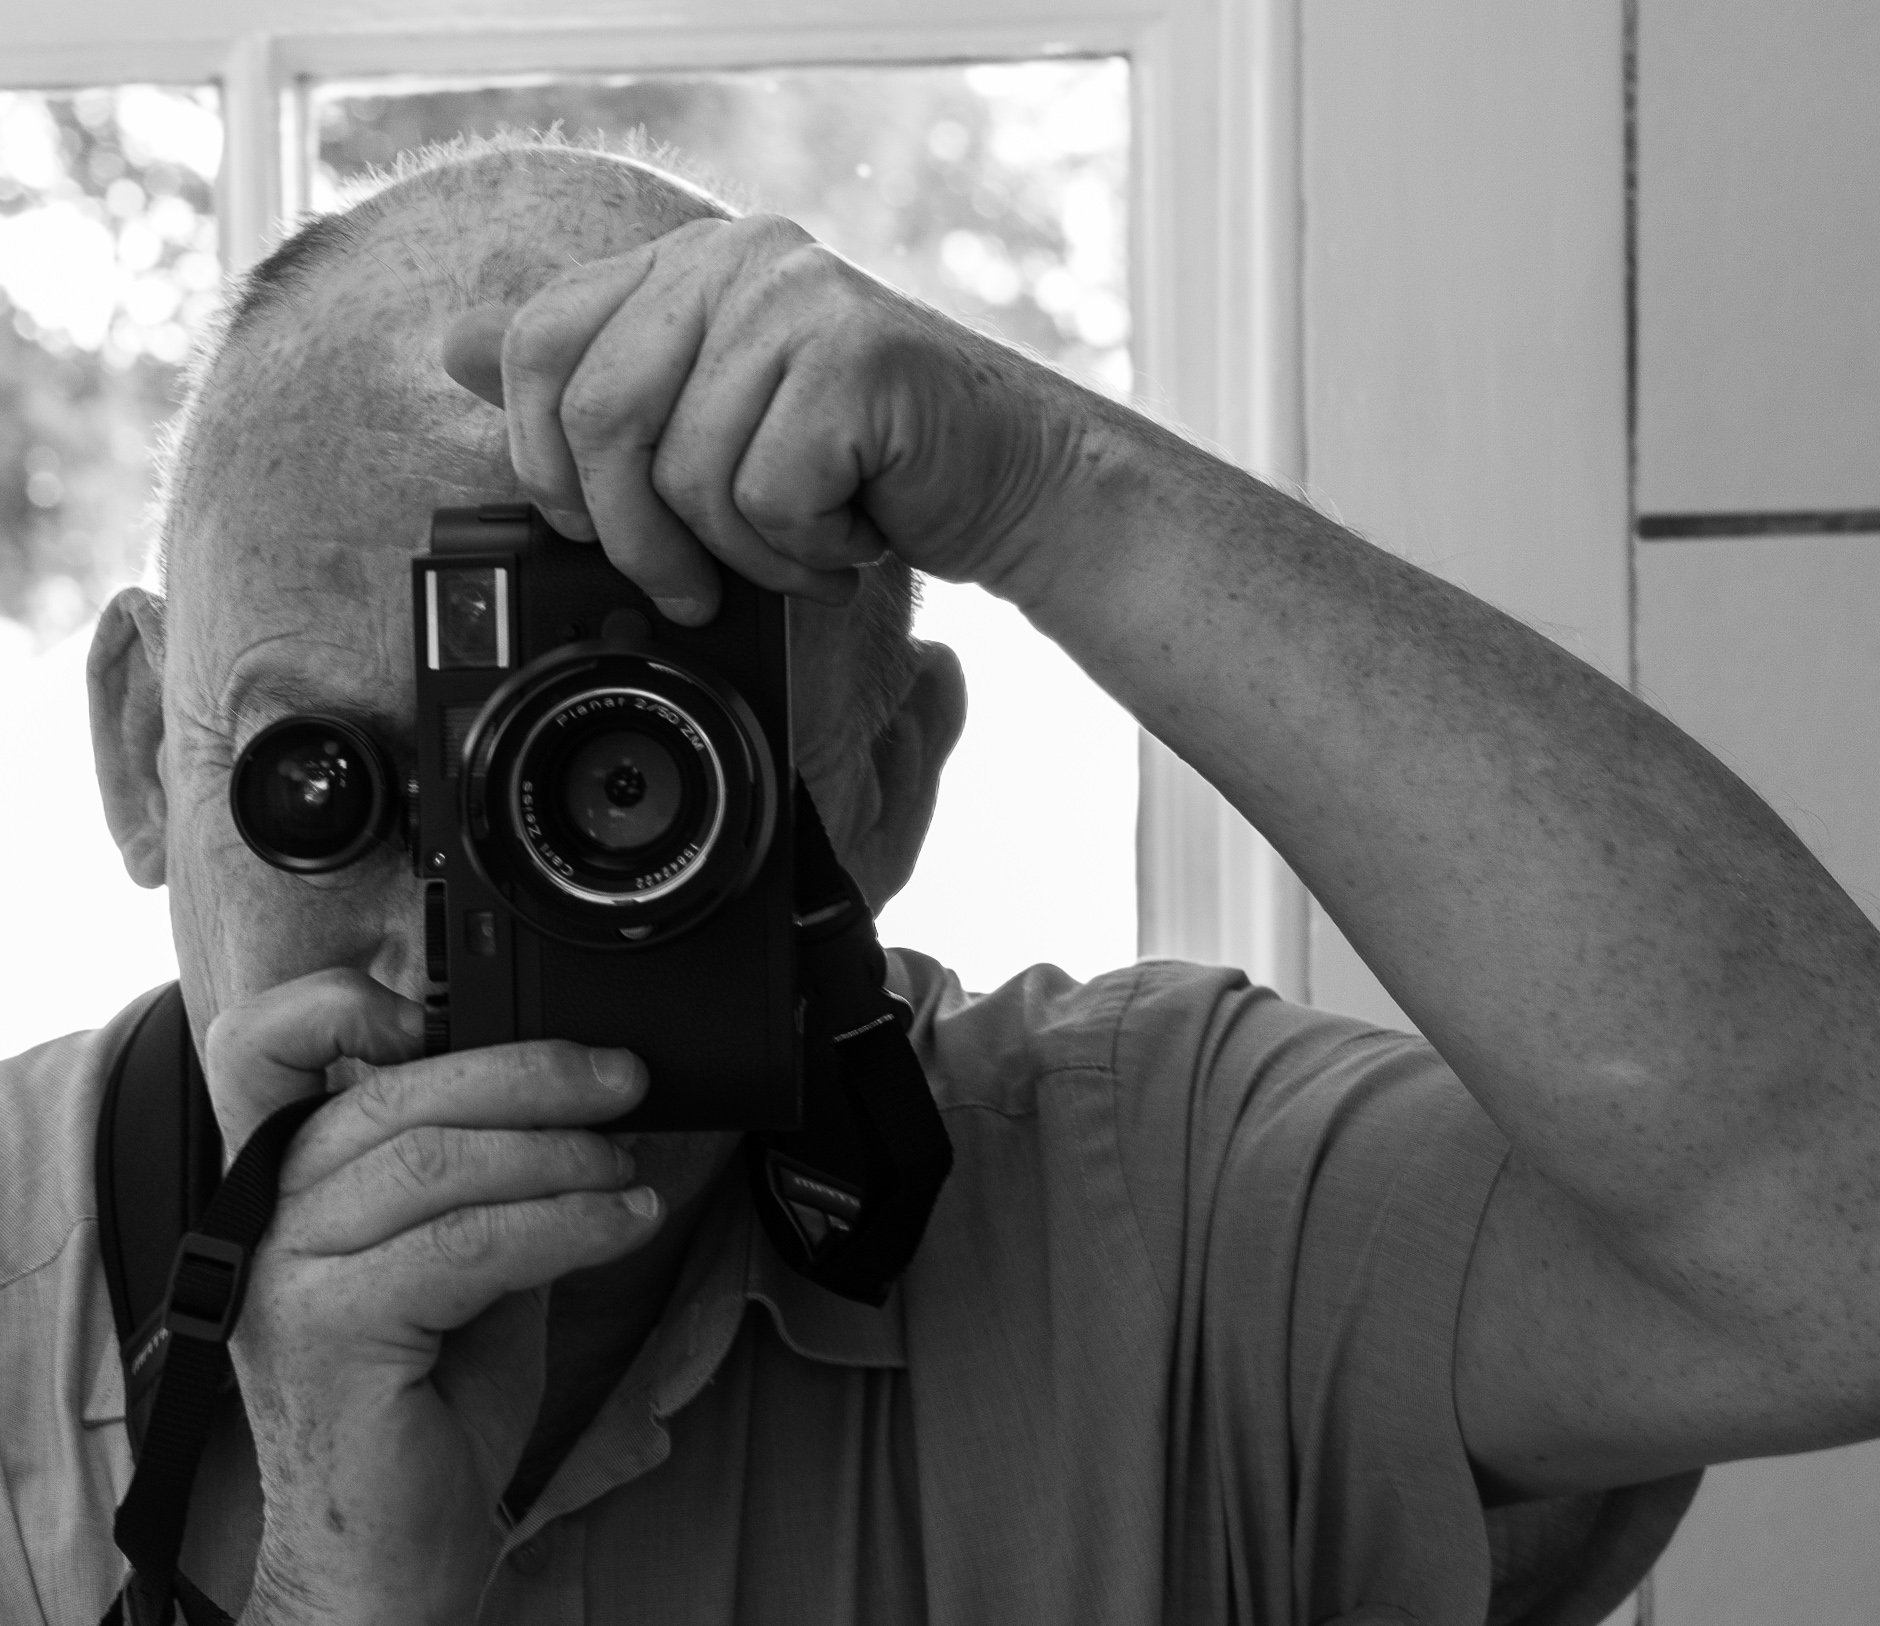 Self Portrait by Robert Campbell in Regular Member Gallery